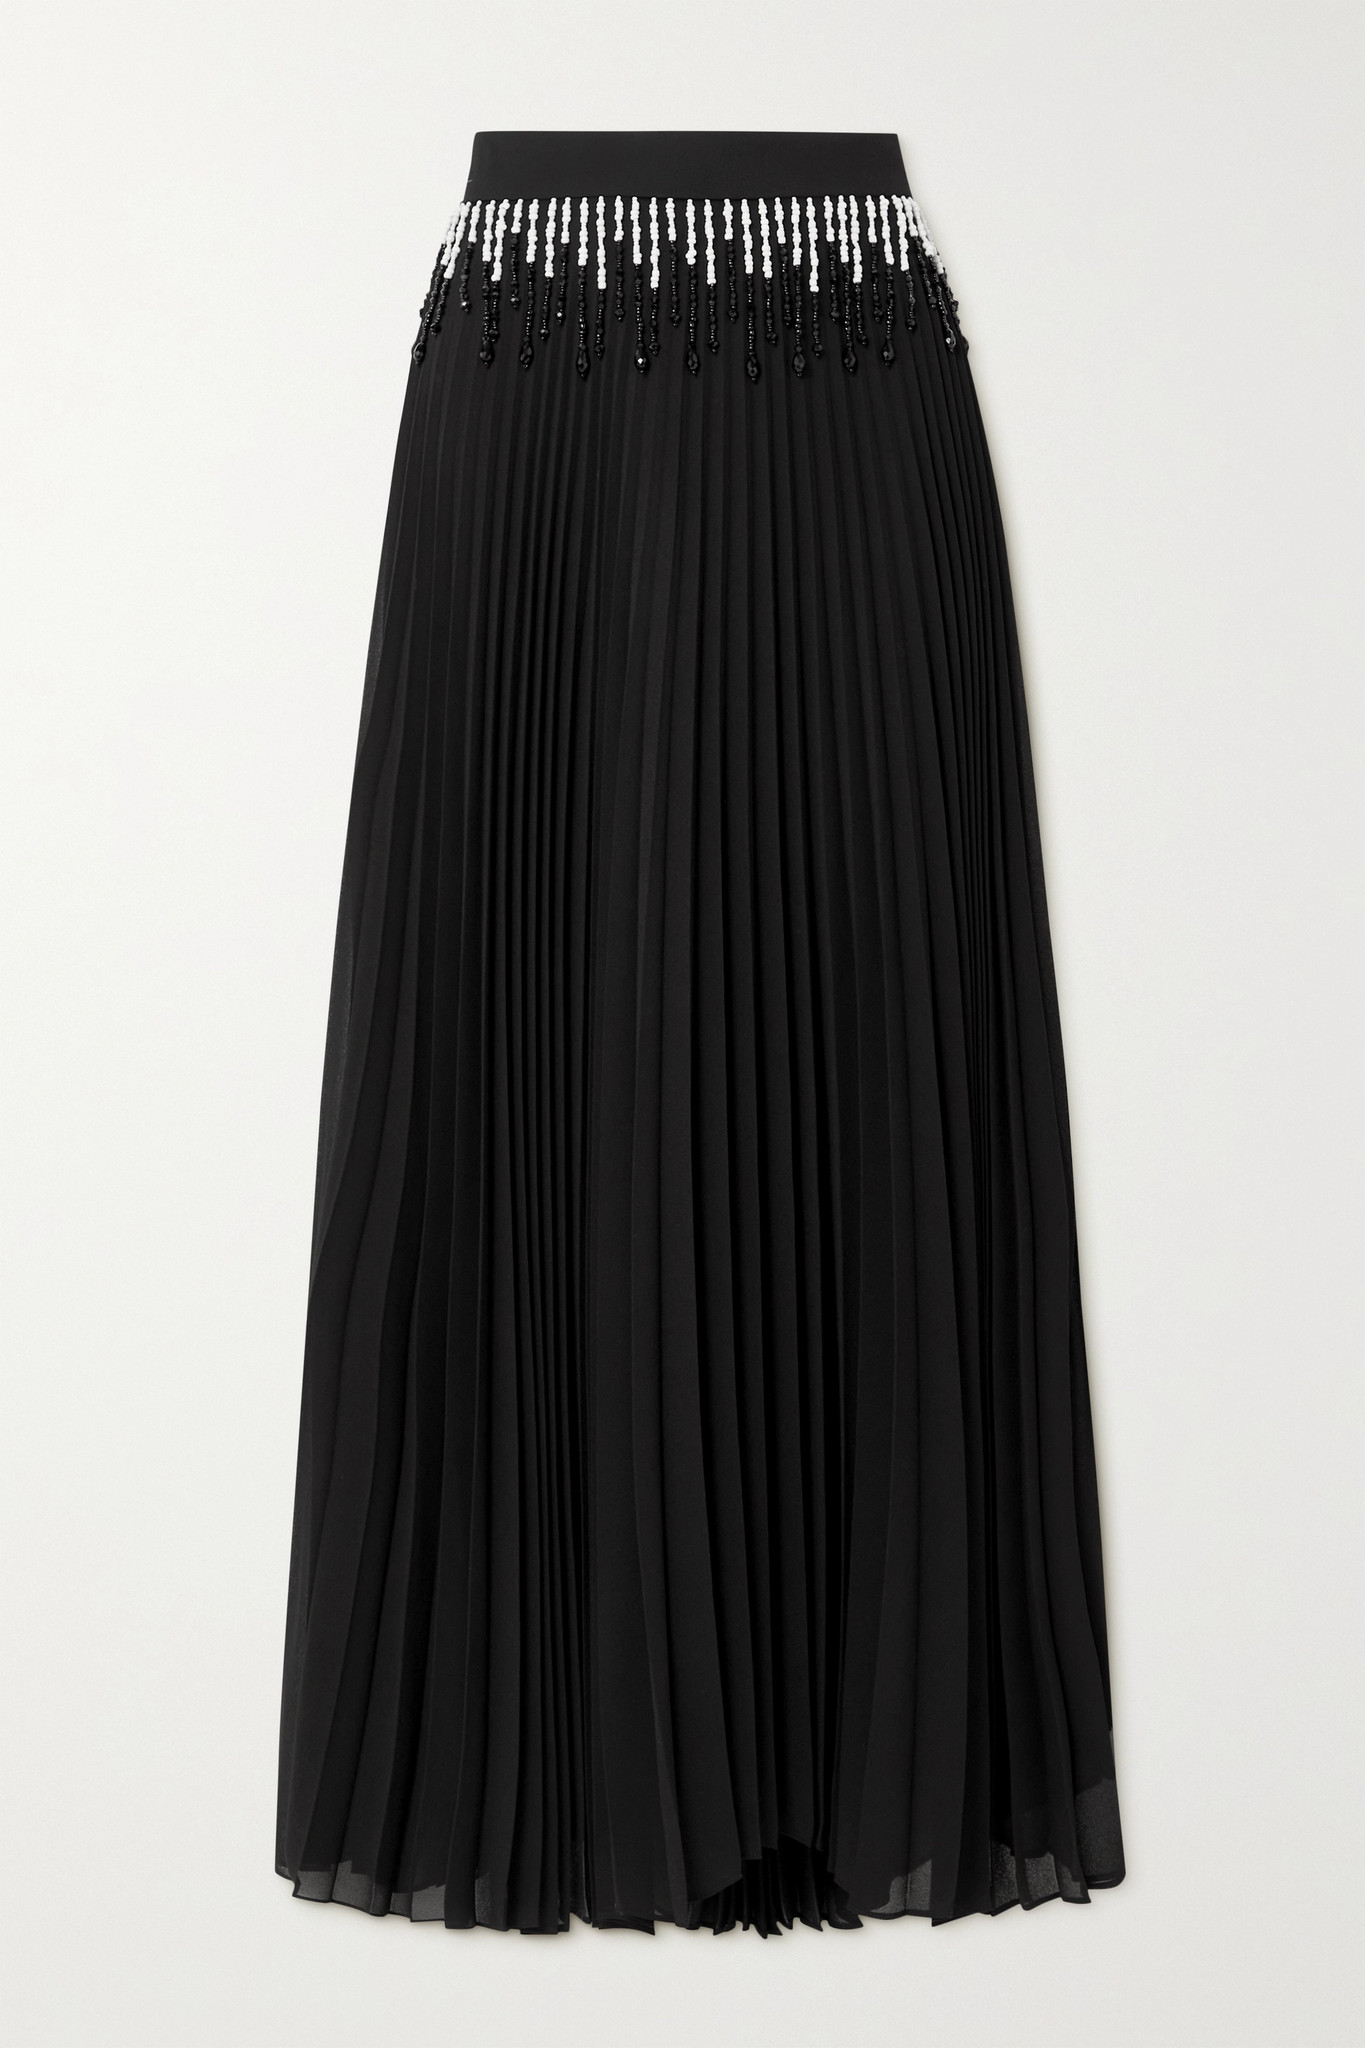 CHRISTOPHER KANE - Bead-embellished Pleated Crepe Maxi Skirt - Black - IT42